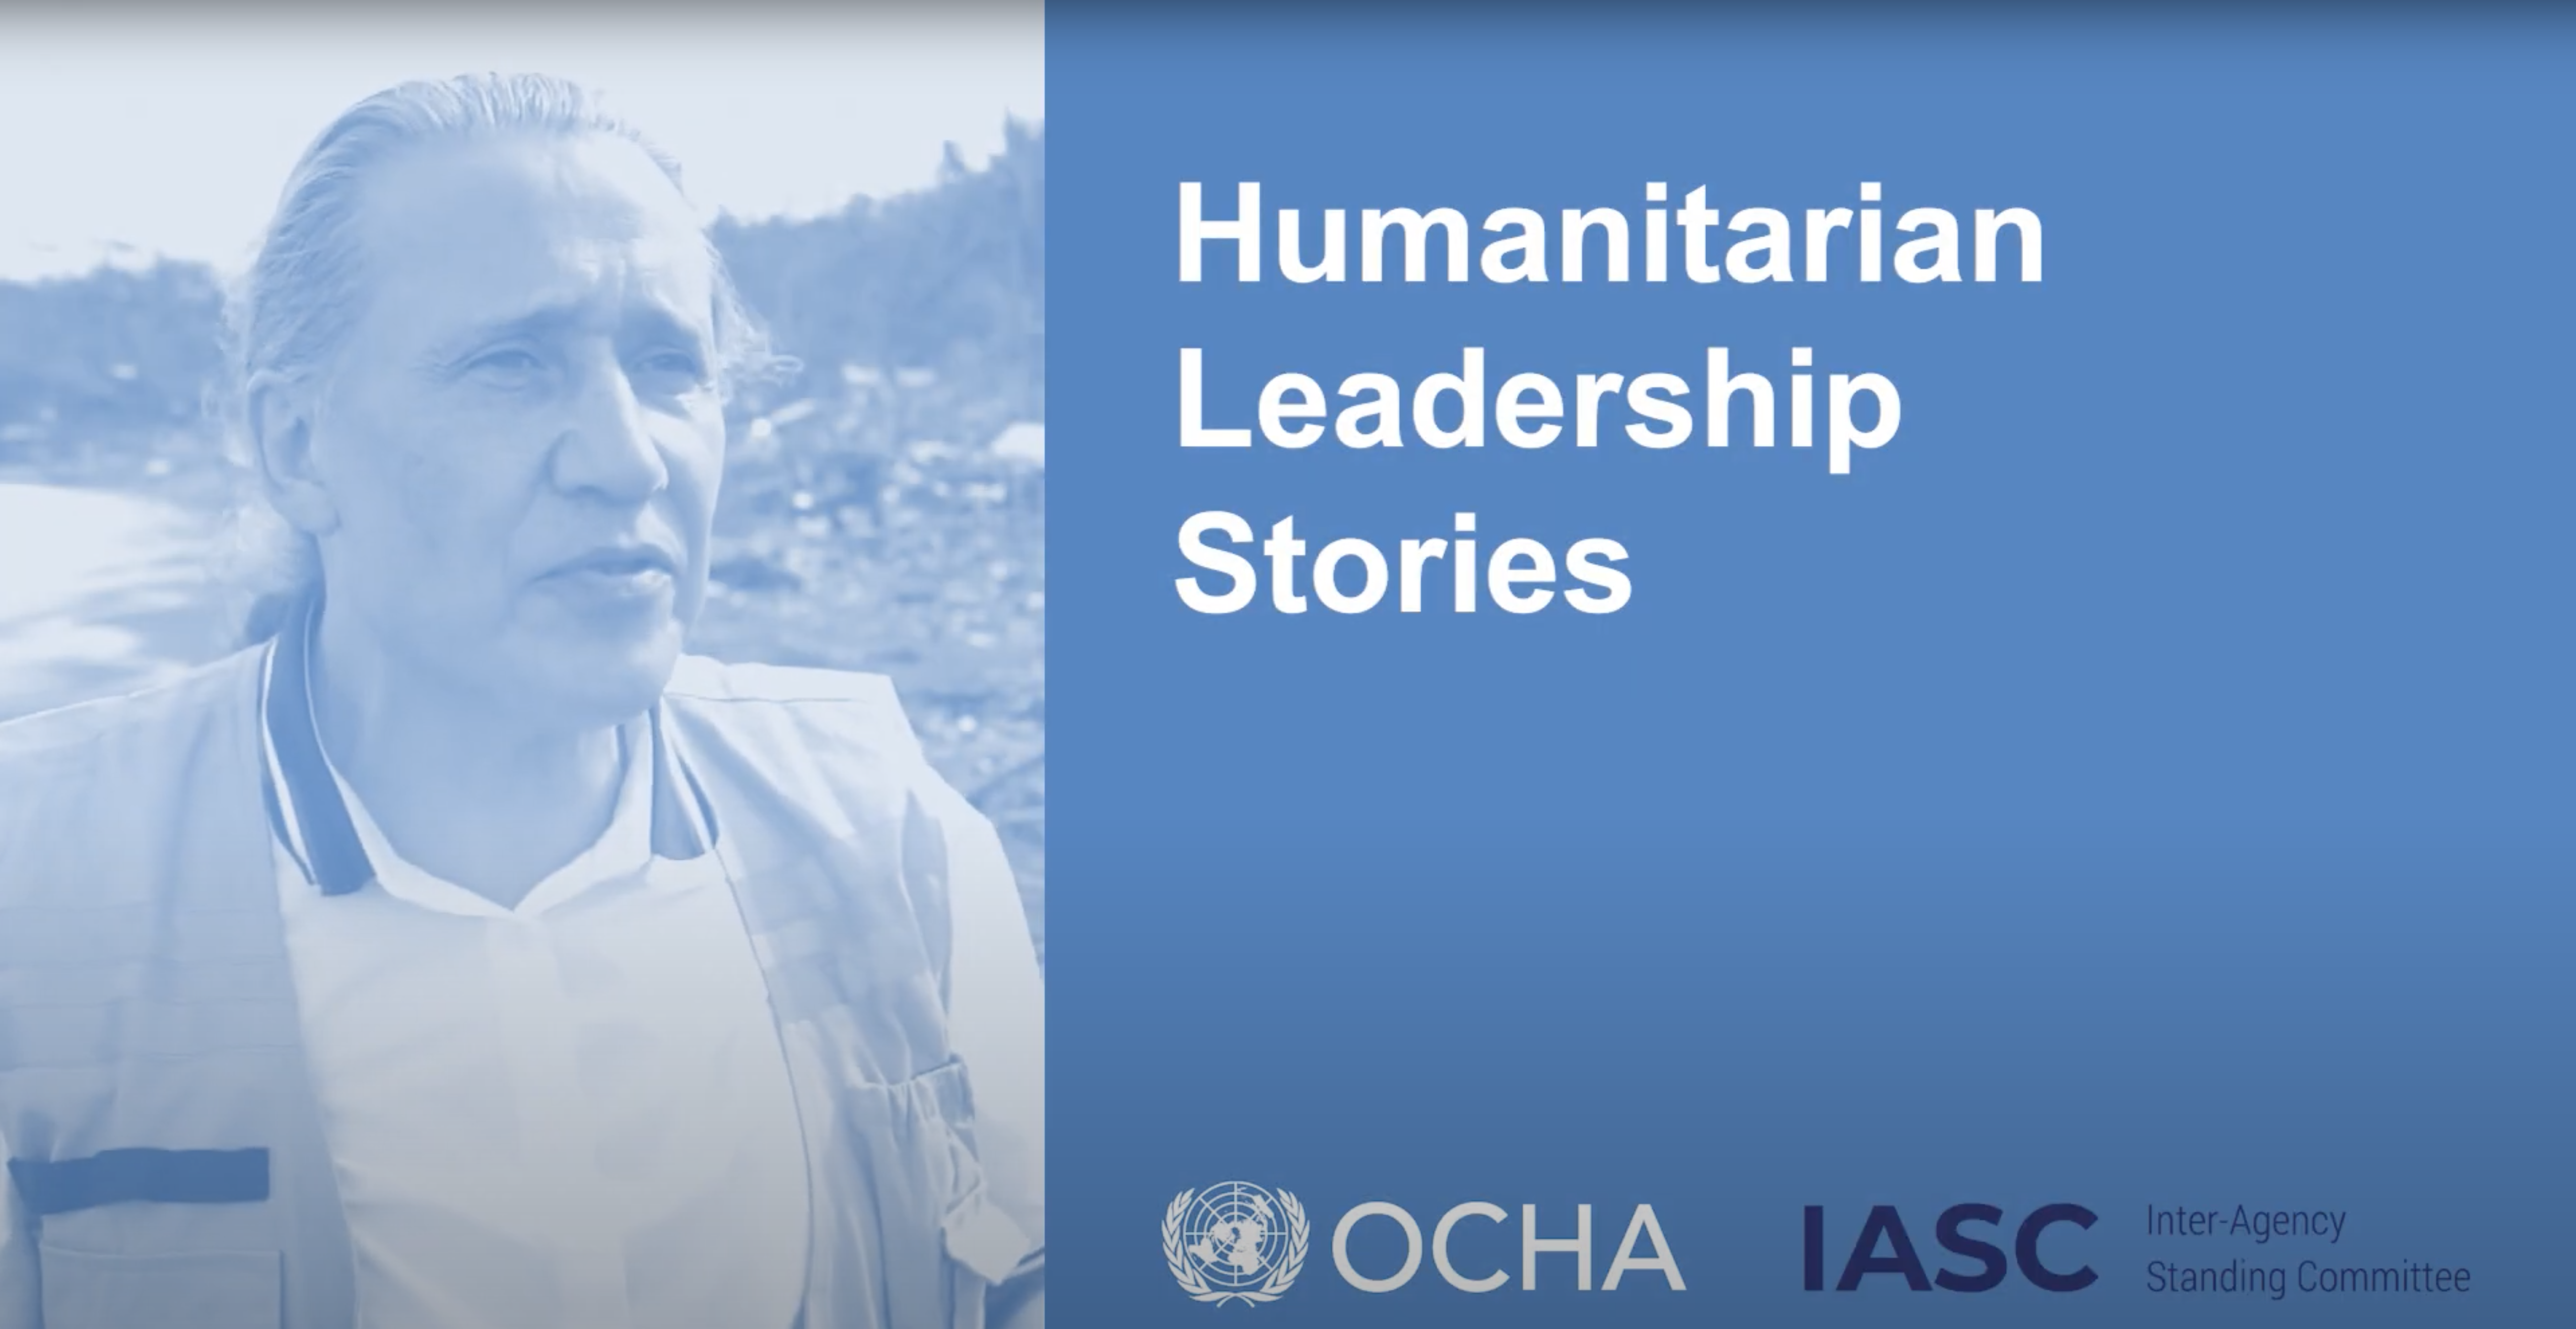 Gustavo Gonzalez's humanitarian leadership story